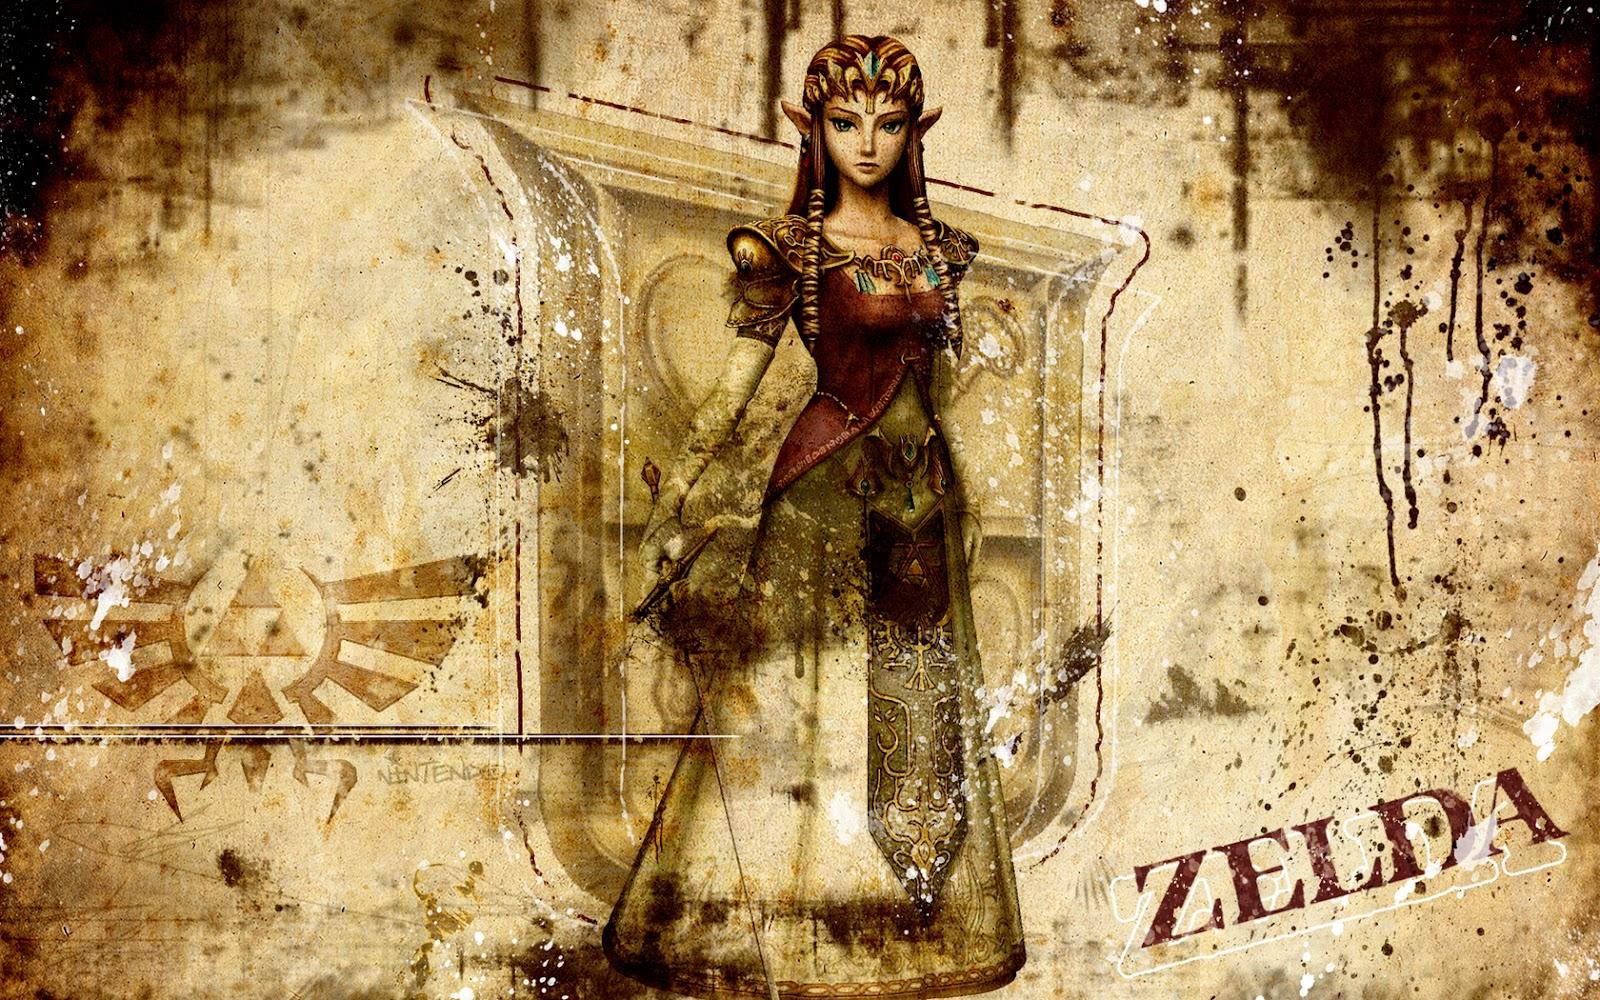 Video Game Gallery The Legend Of Zelda Twilight Princess Wallpaper